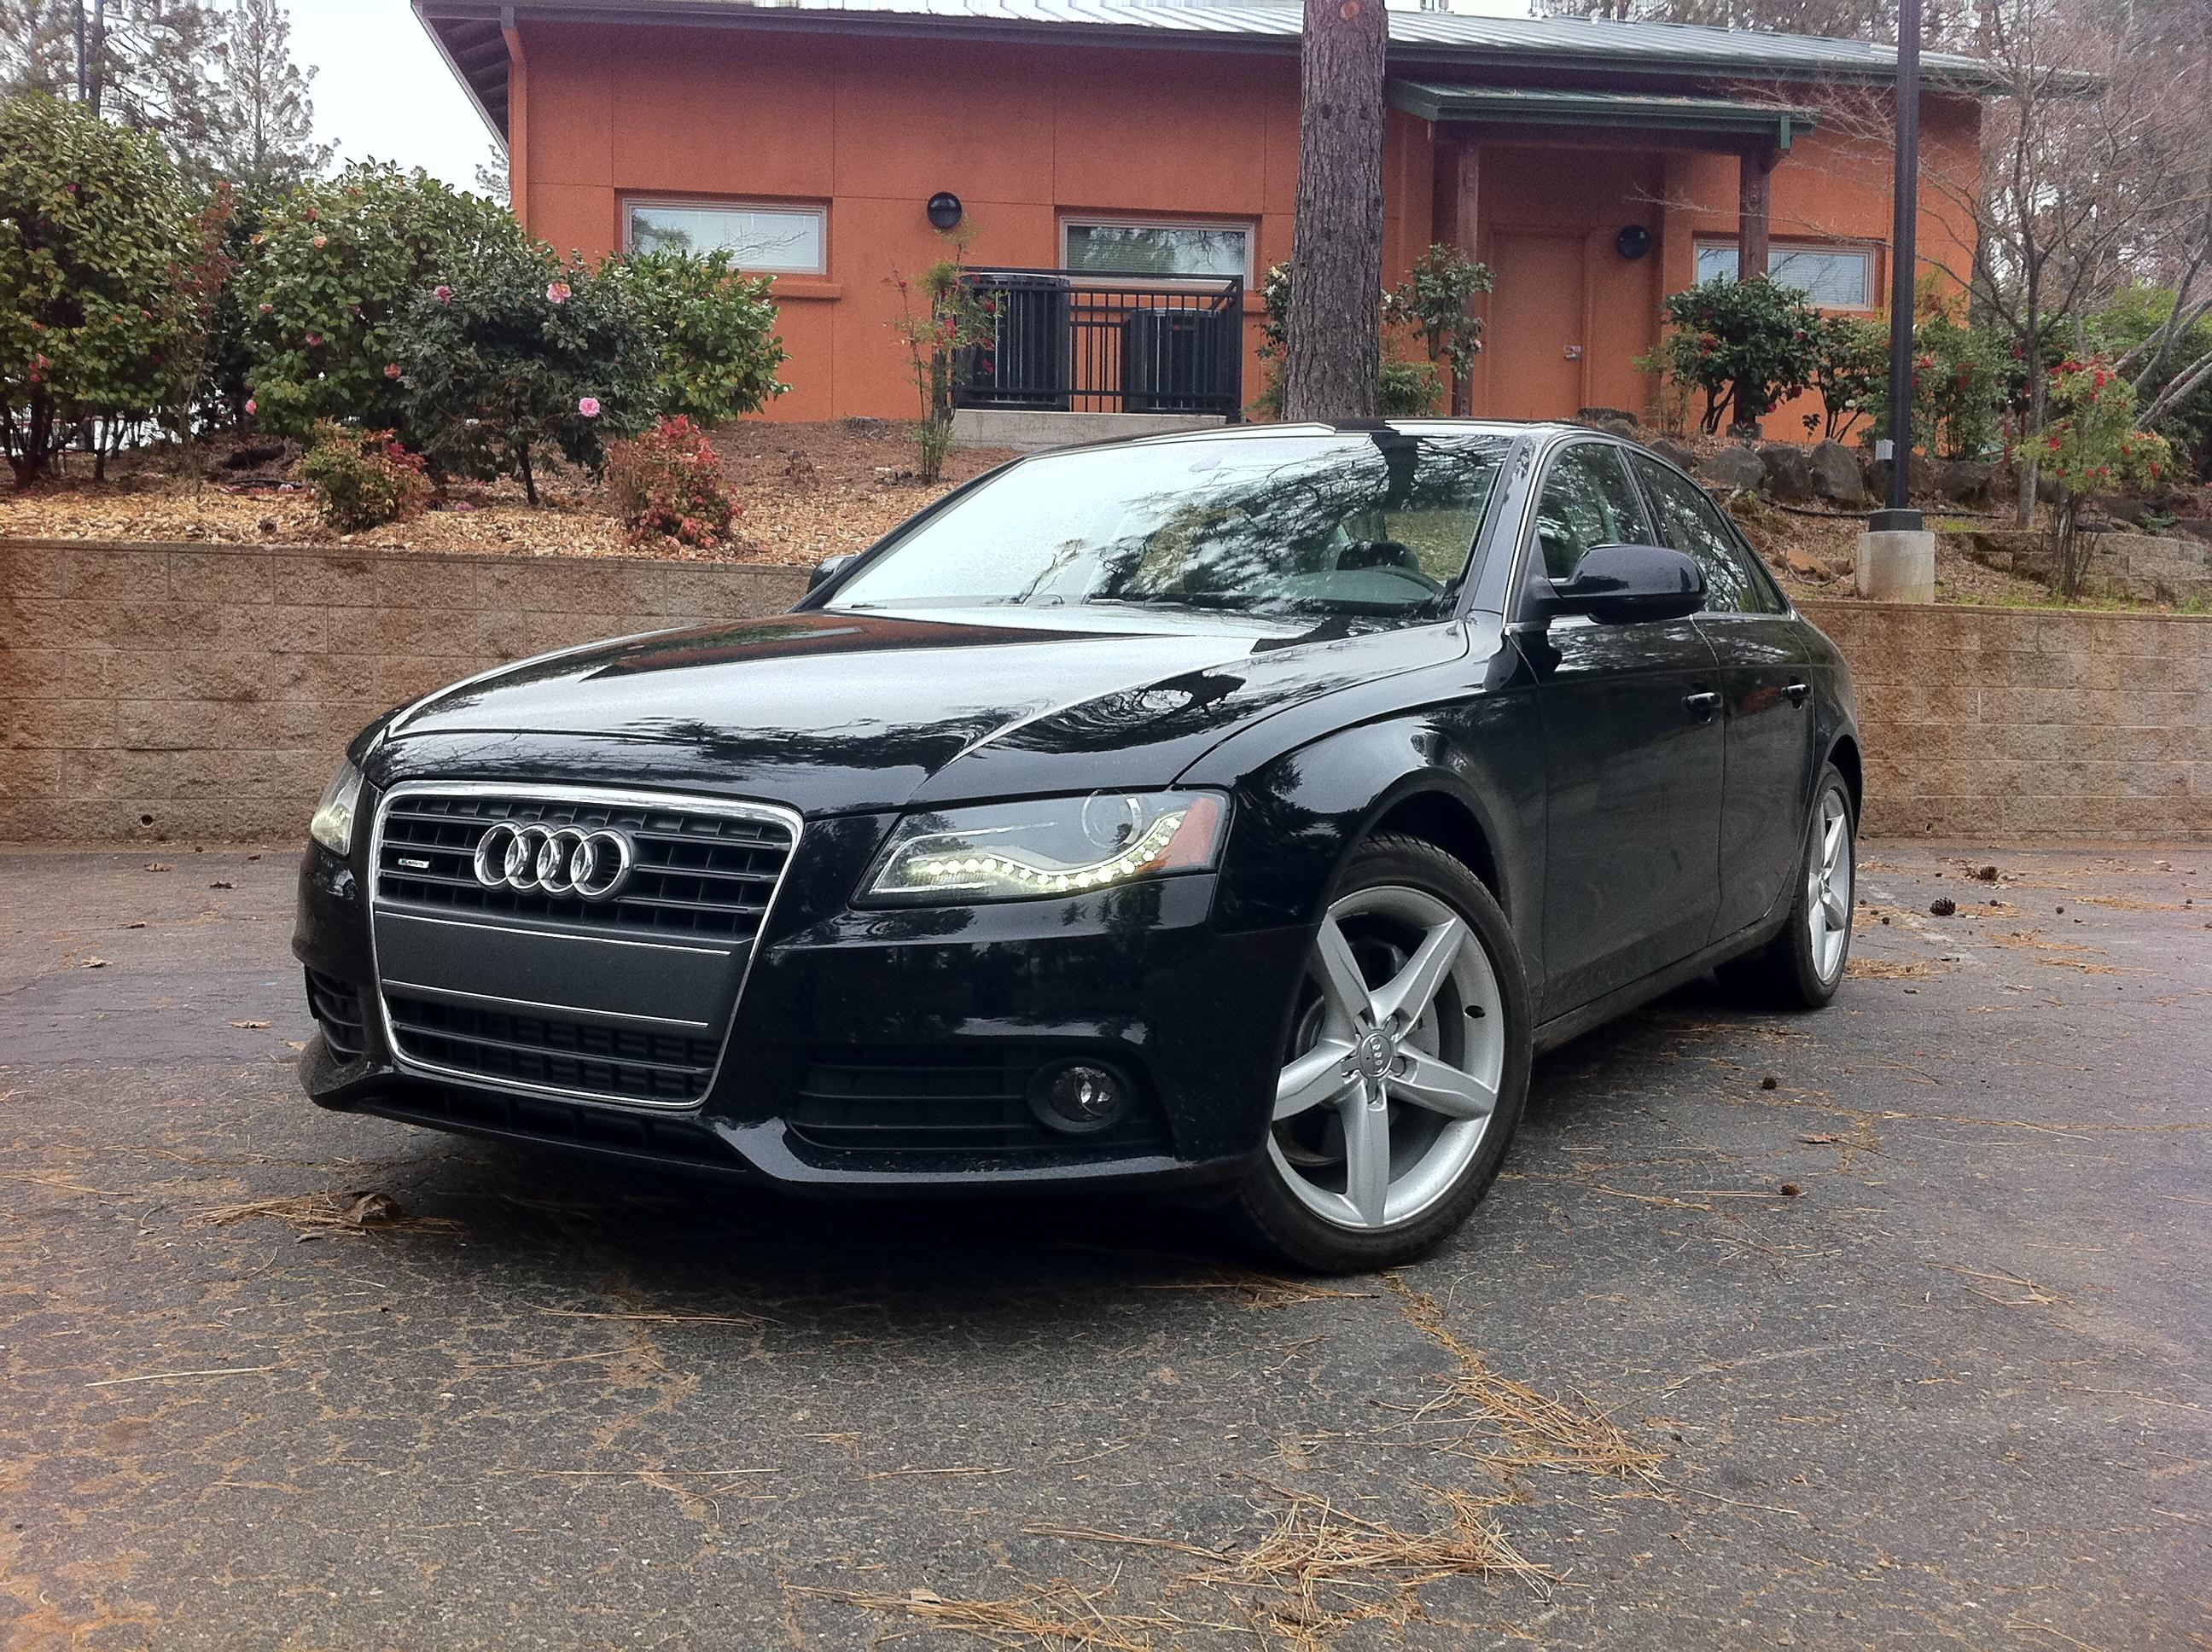 Audi A Review - Audi a4 review